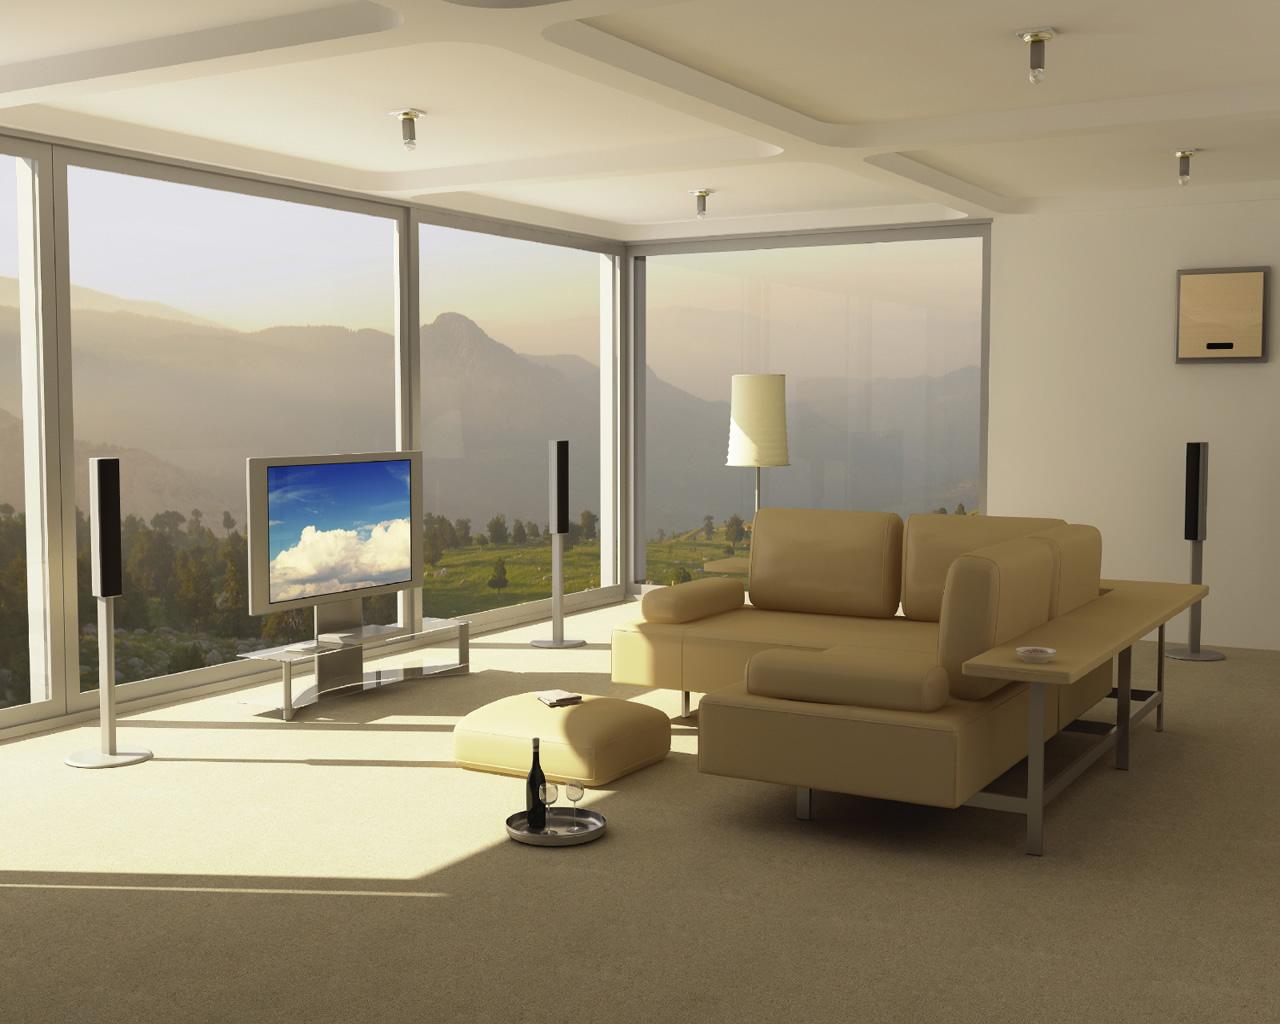 http://1.bp.blogspot.com/-g62b4UmqiFg/TyAEDVtwnSI/AAAAAAAAD-Y/gZPnBDlk_LI/s1600/living_room_wallpaper_1280x1024.jpg